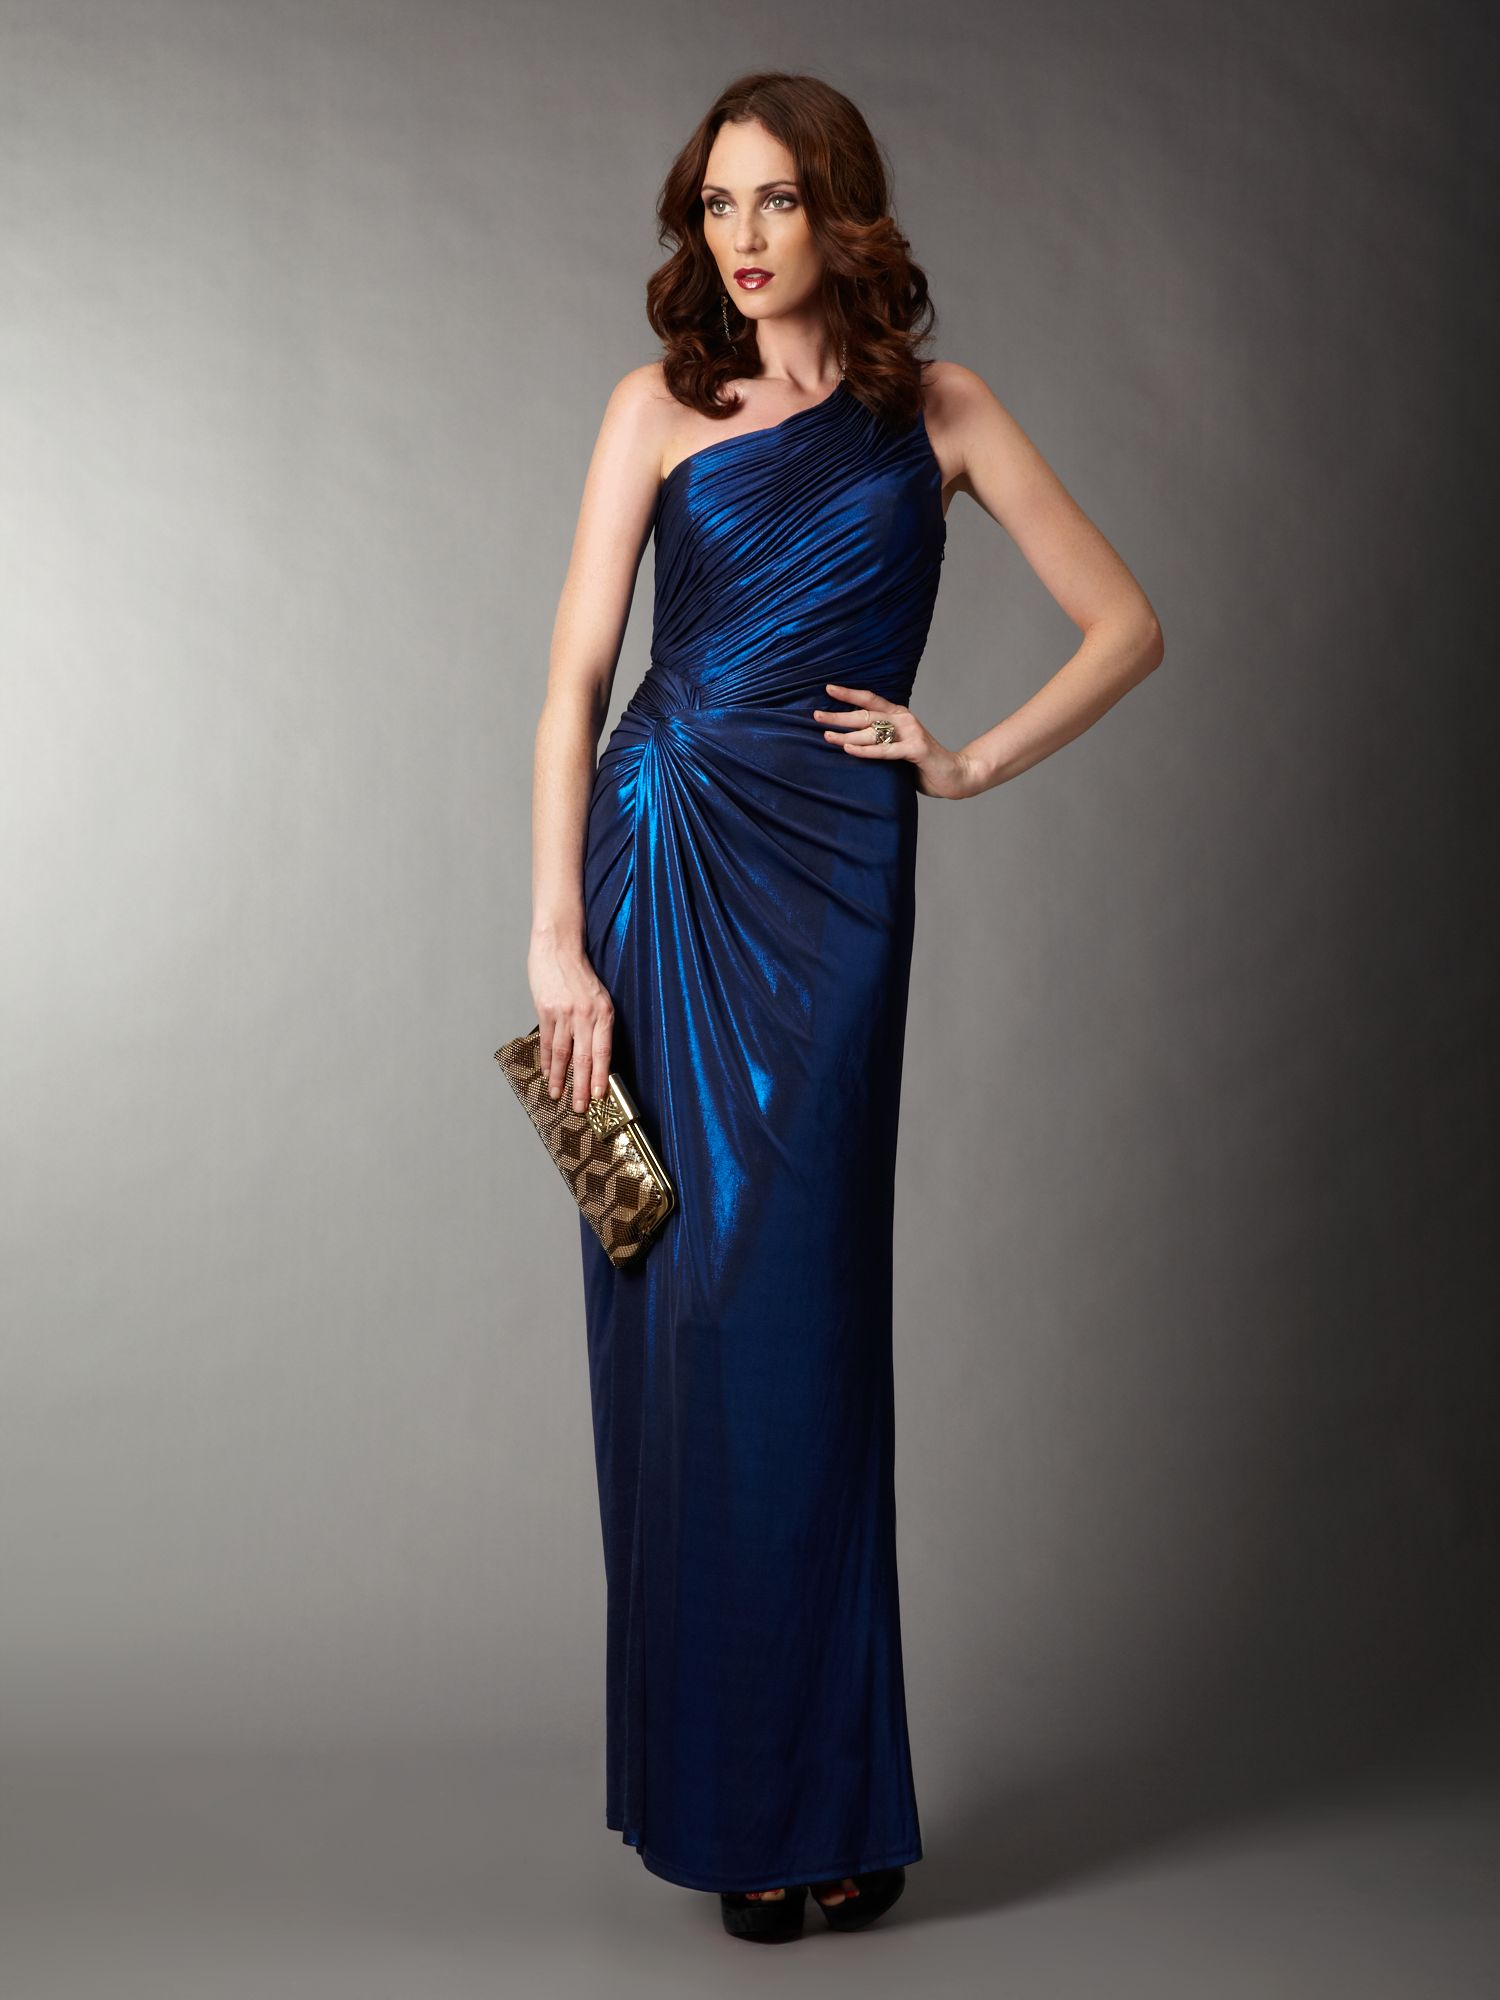 Biba Asymmetric One Shoulder Maxi Dress in Blue  Lyst